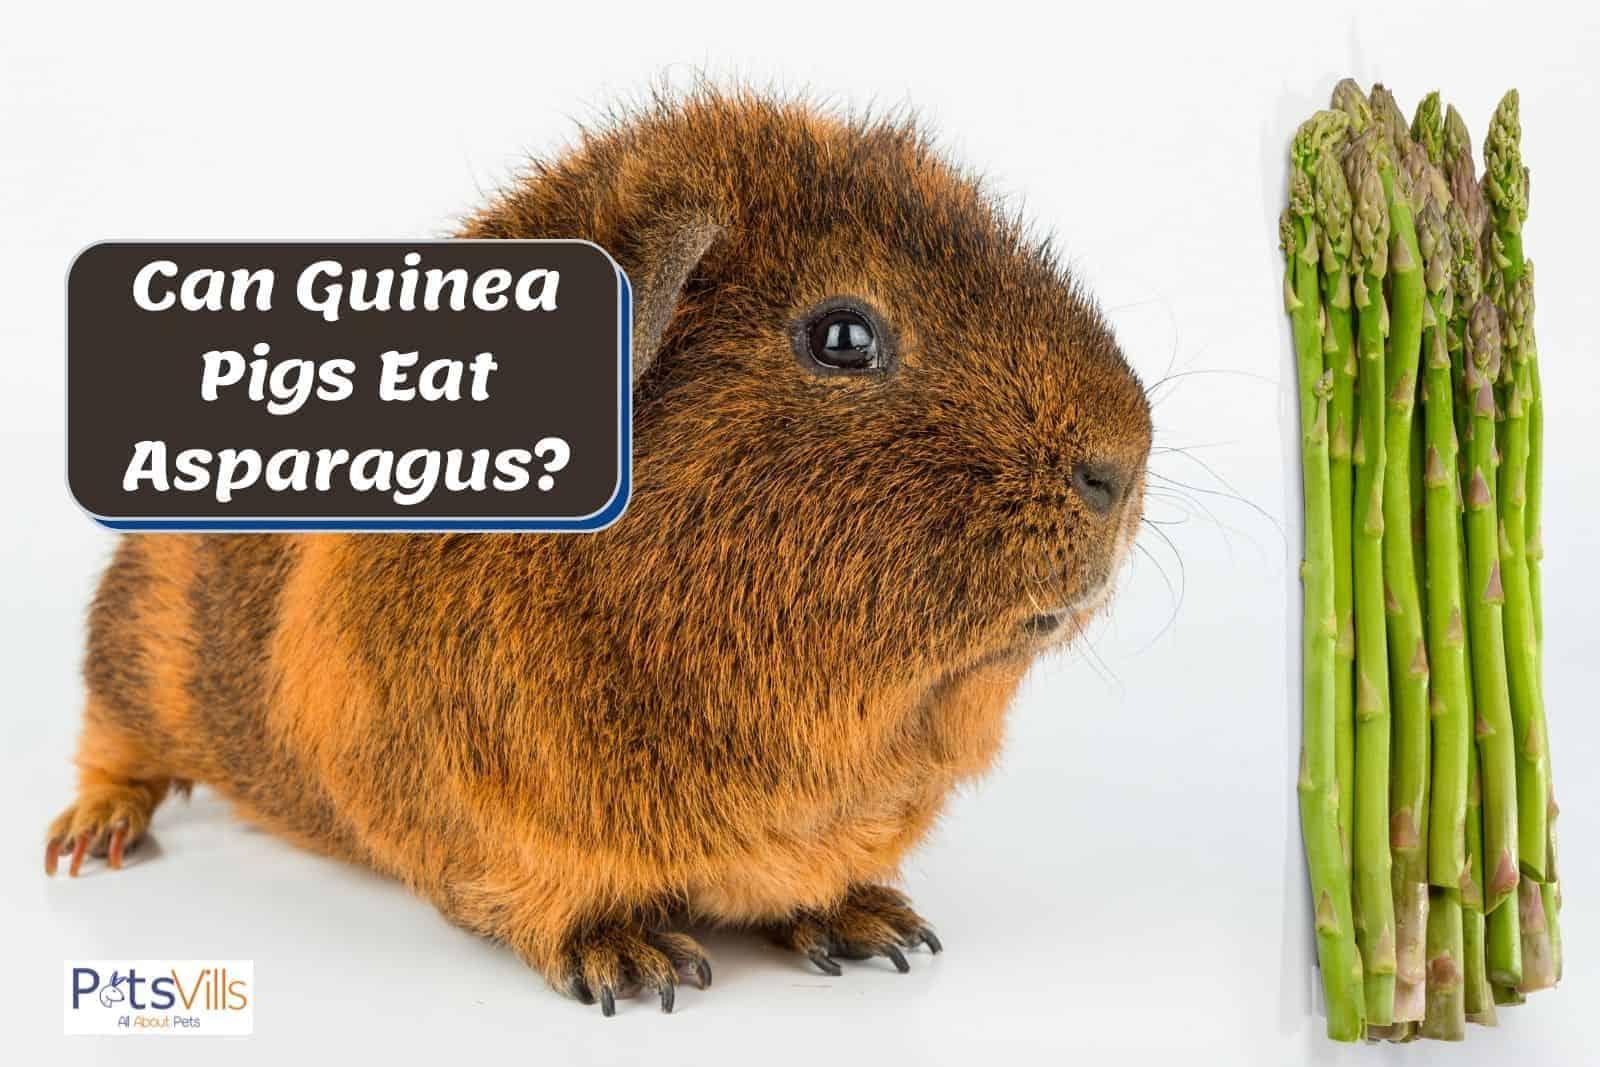 guinea pig smelling asparagus but can guinea pigs eat asparagus?